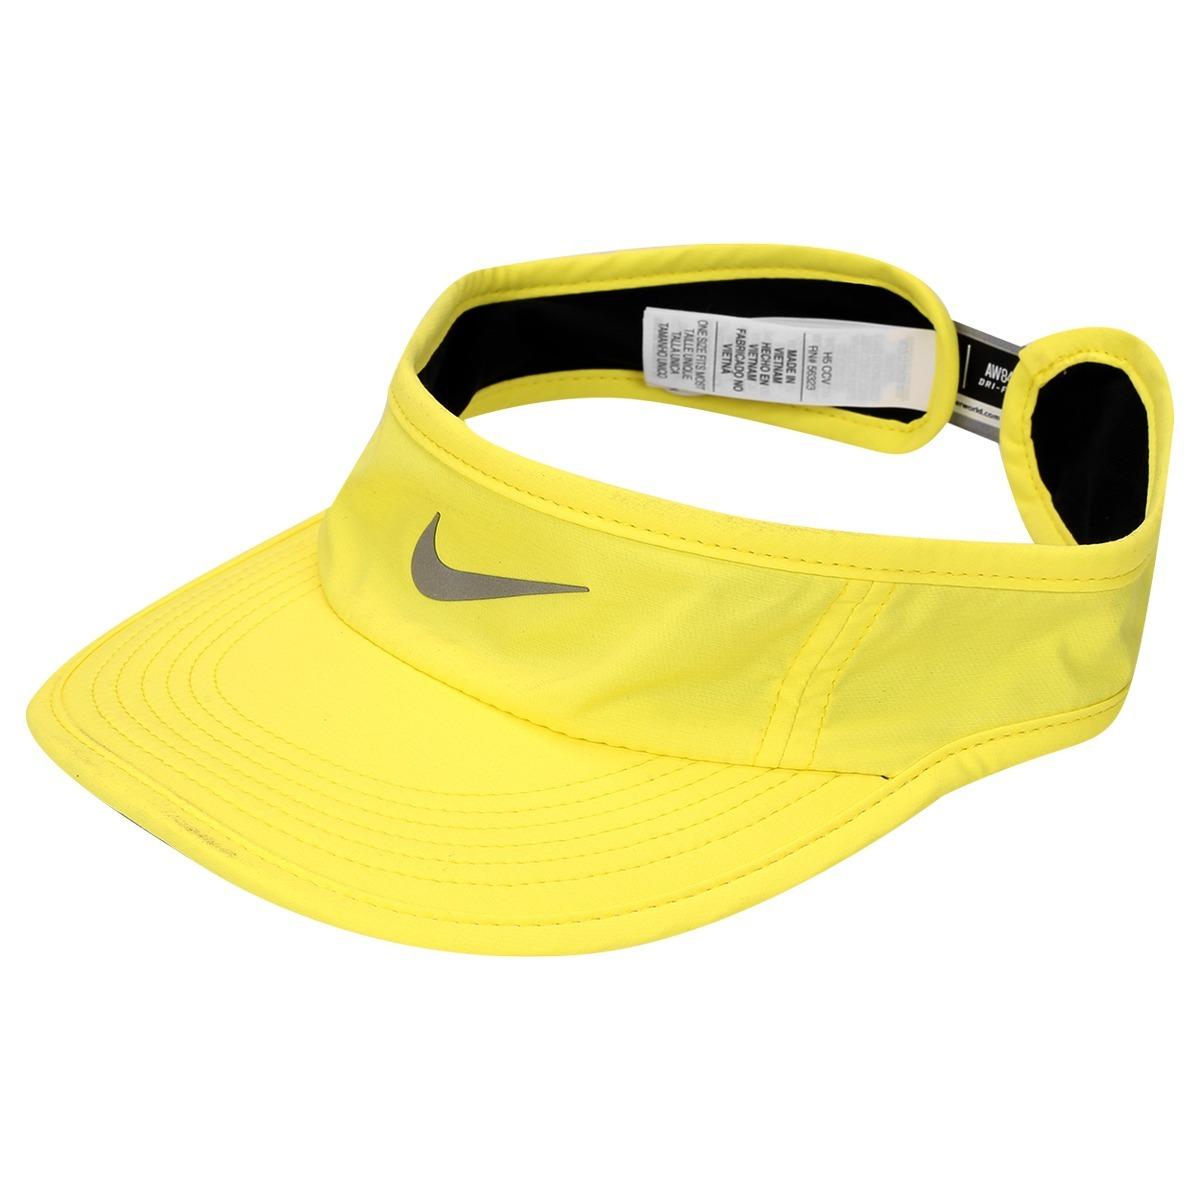 b4da0e08ed500 Viseira Nike Aw84 Dri-fit (original) Amarela  corrida  fit - R  134 ...